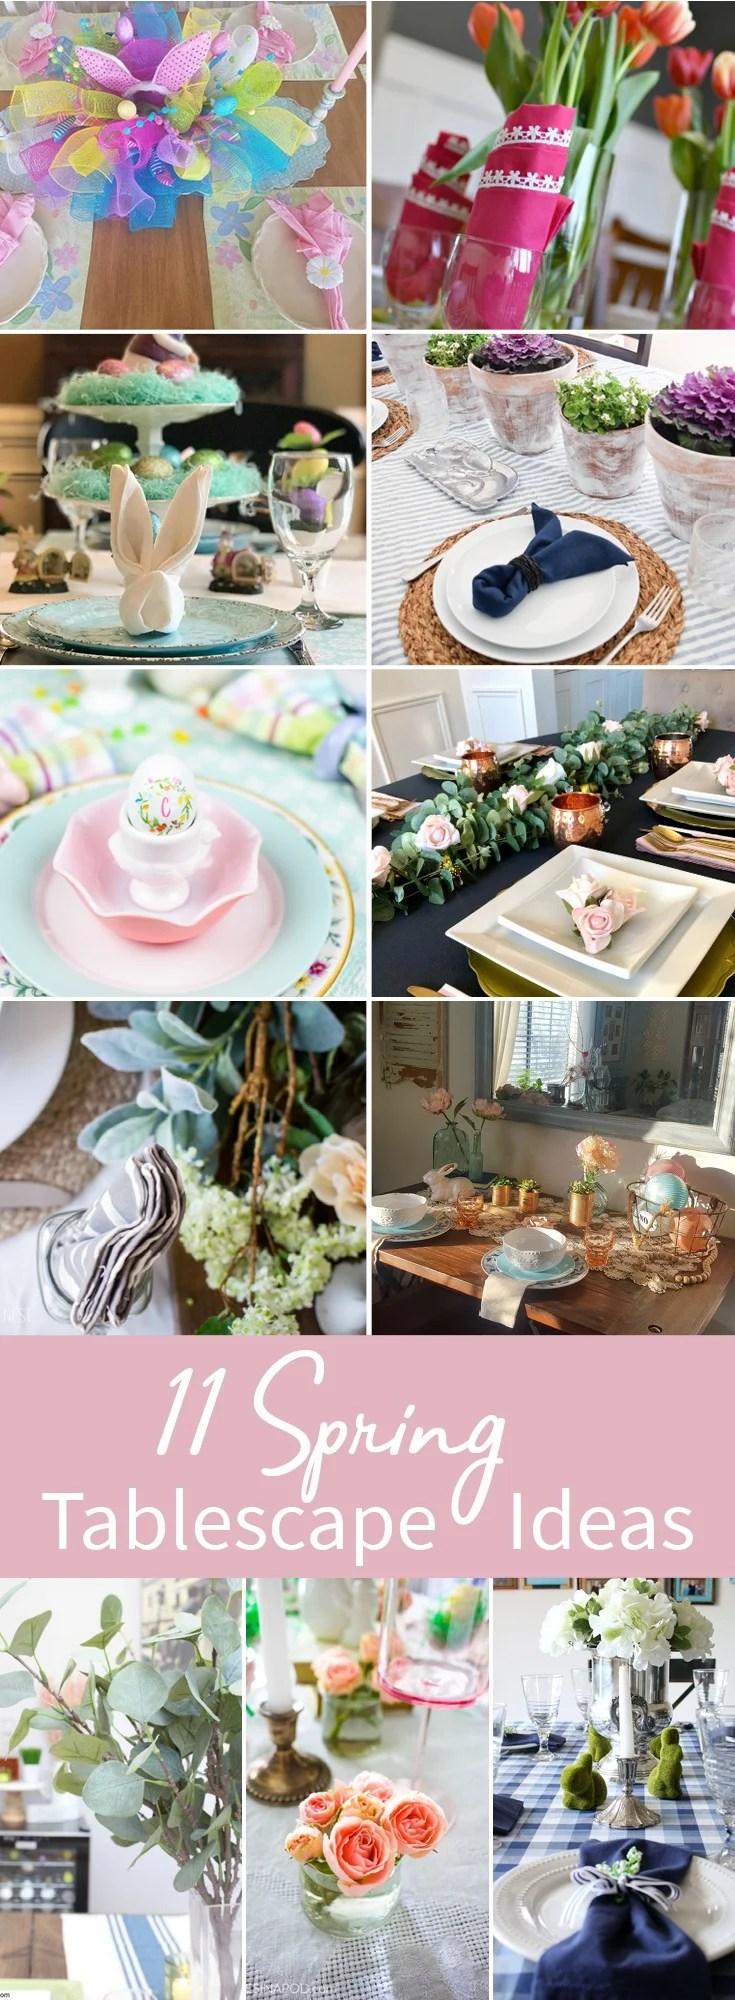 11 Spring Tablescape Ideas. Spring Table Decoration Ideas